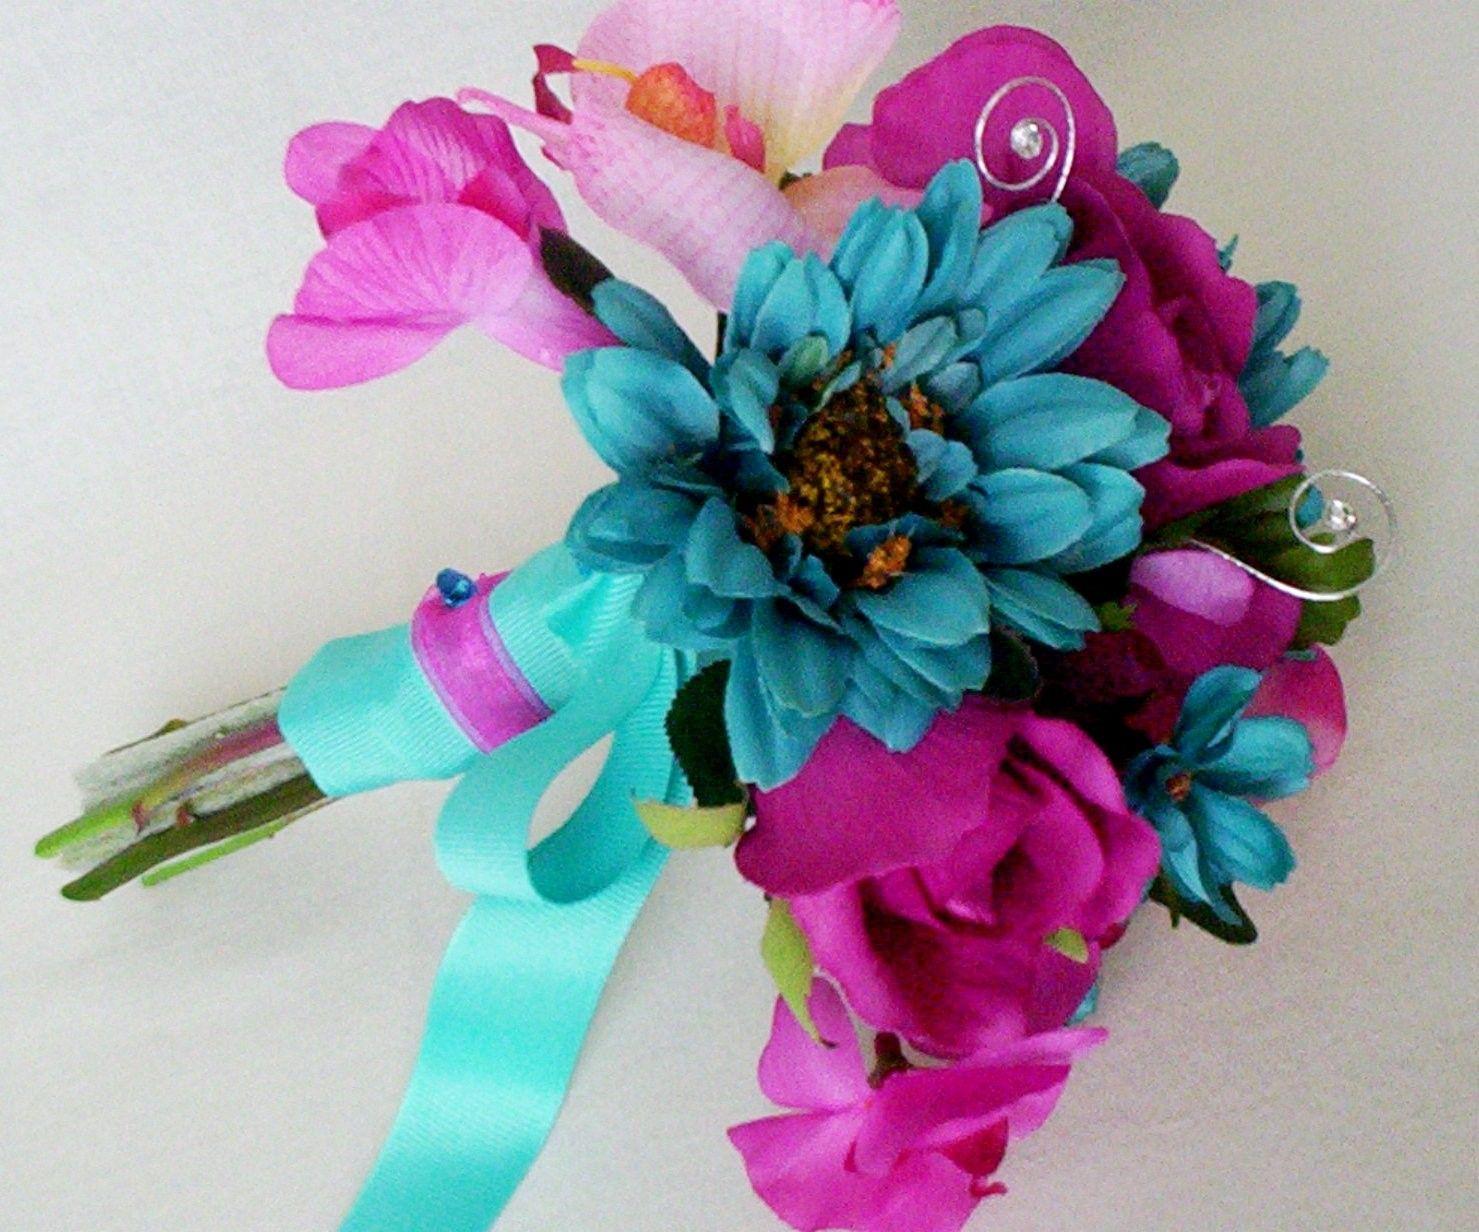 Turquoise wedding flowers fuschia silk bridal bouquet package teal touqourise wedding flowers bridal bouquet turquoise wedding flowers fuschia silk bridal bouquet package teal mightylinksfo